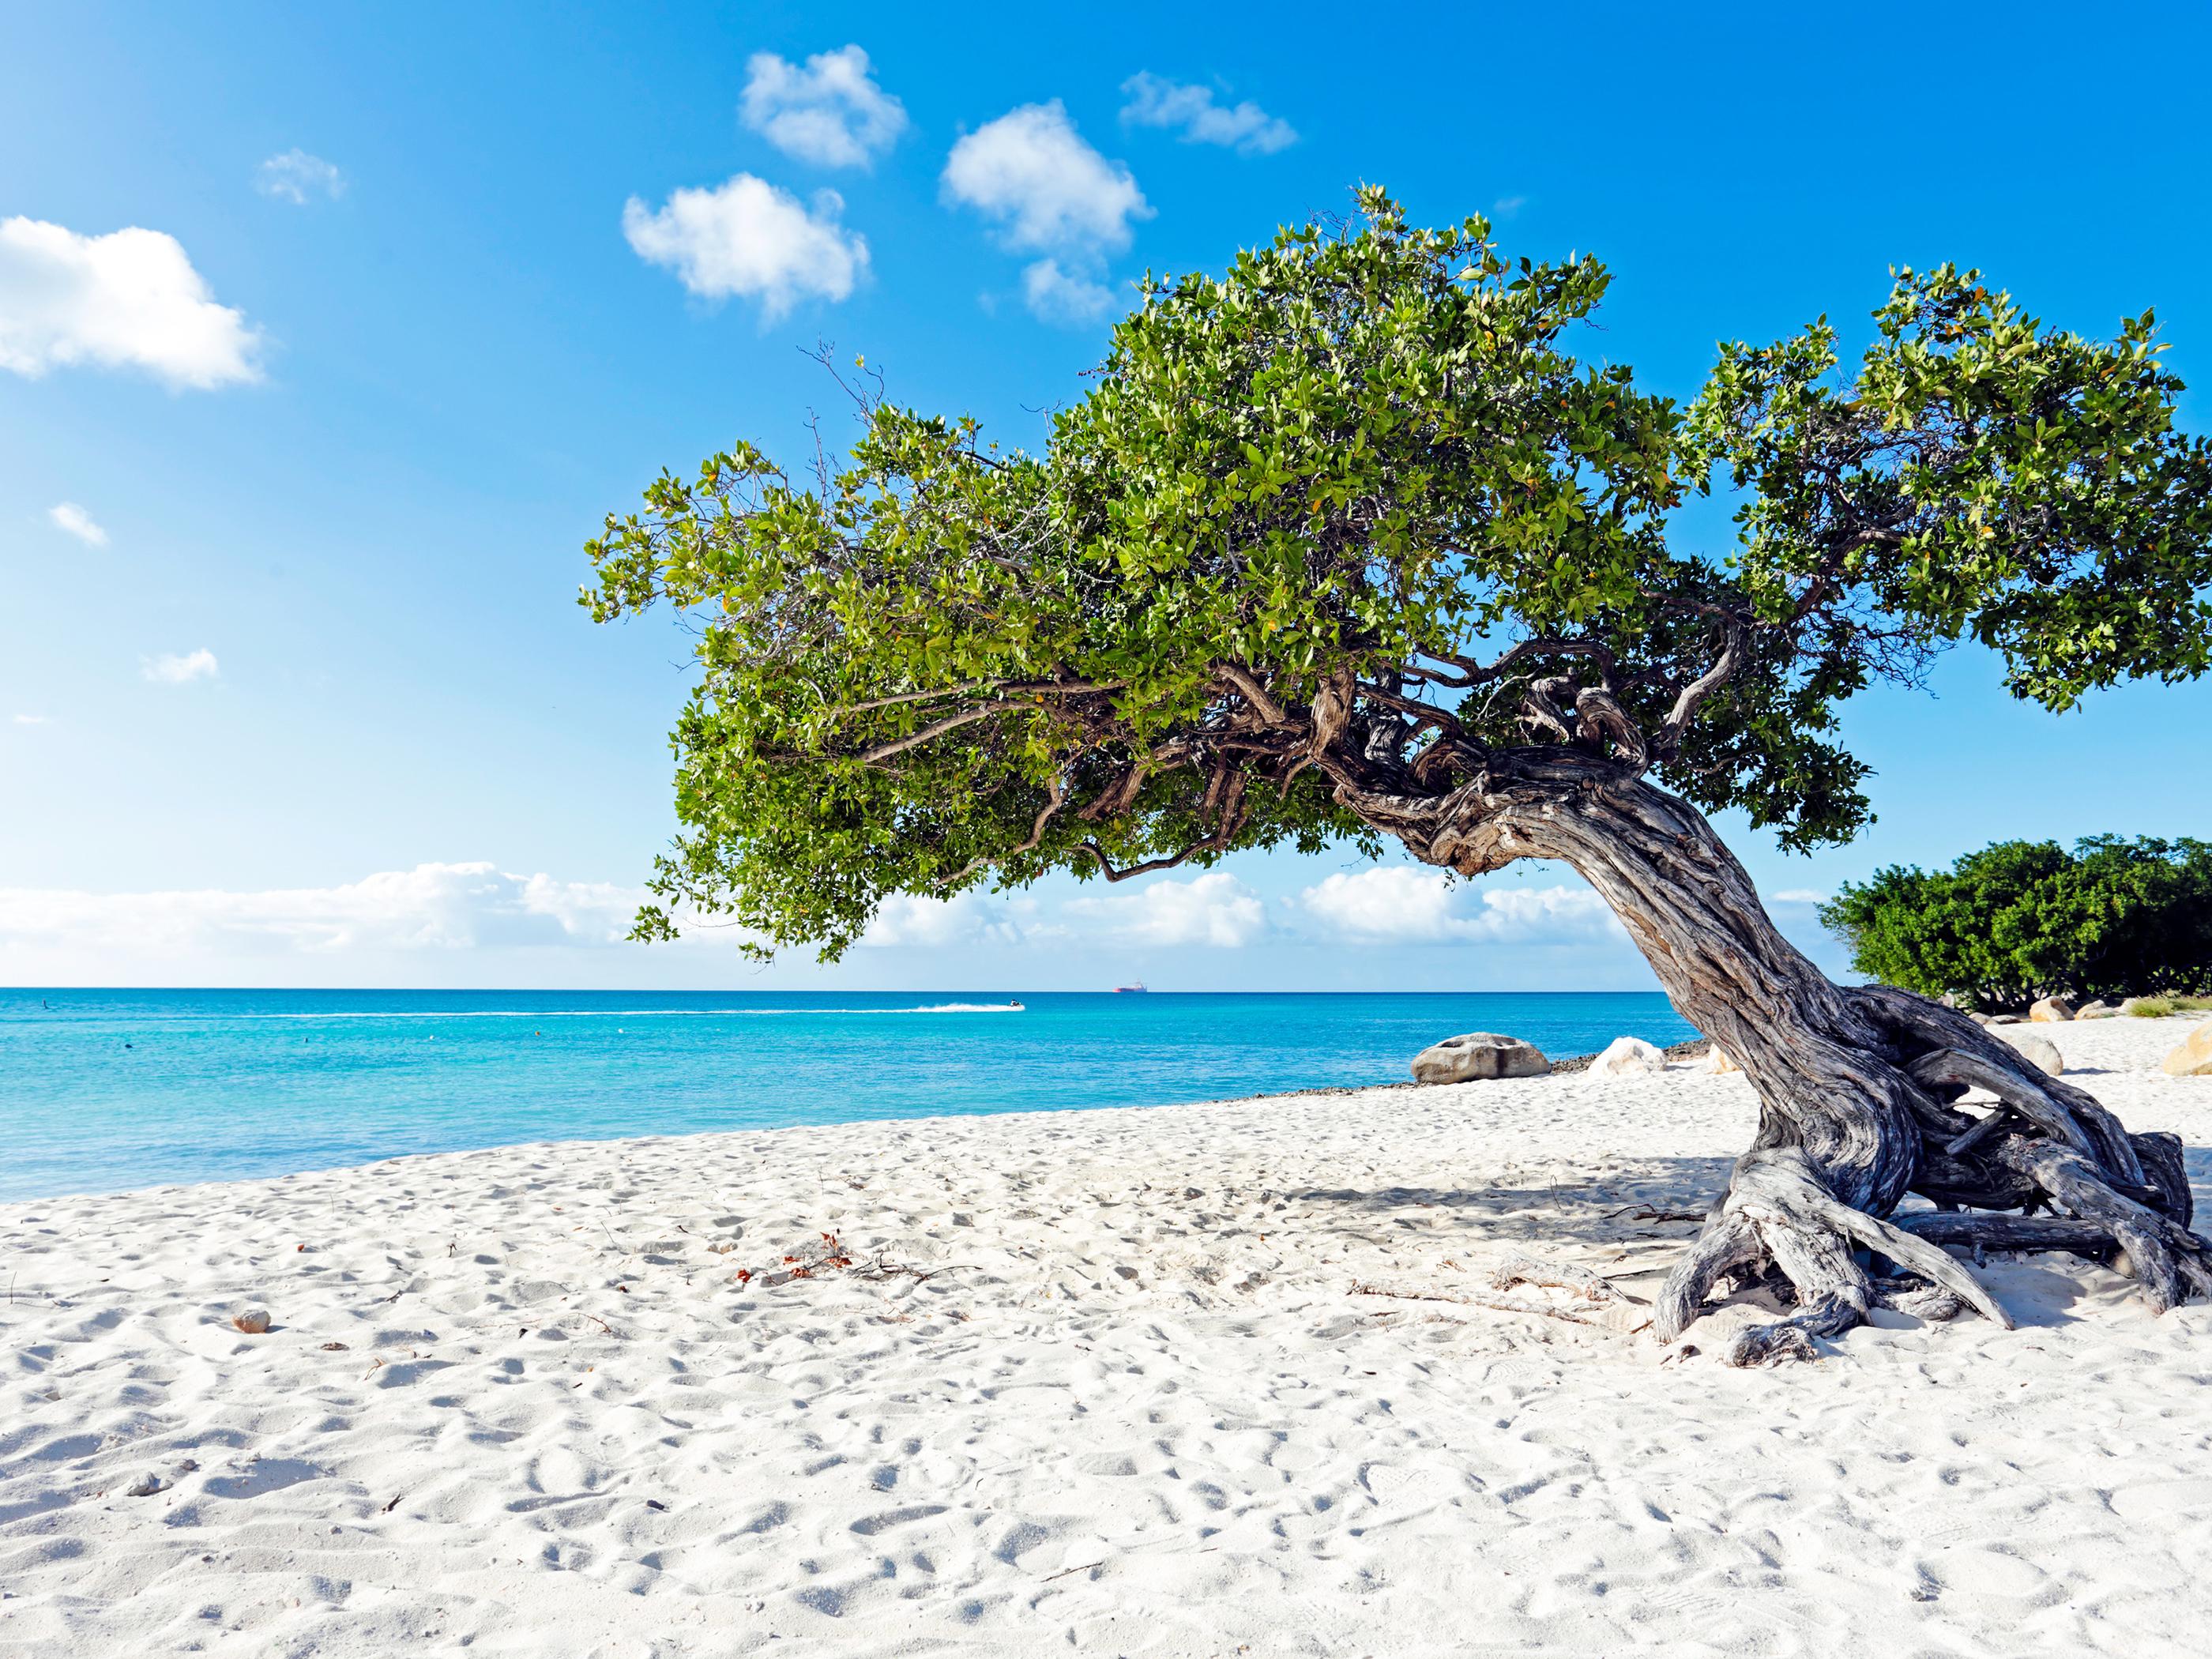 Divi-divi boom tree at the sunny beach in Aruba - Beach Wallpapers